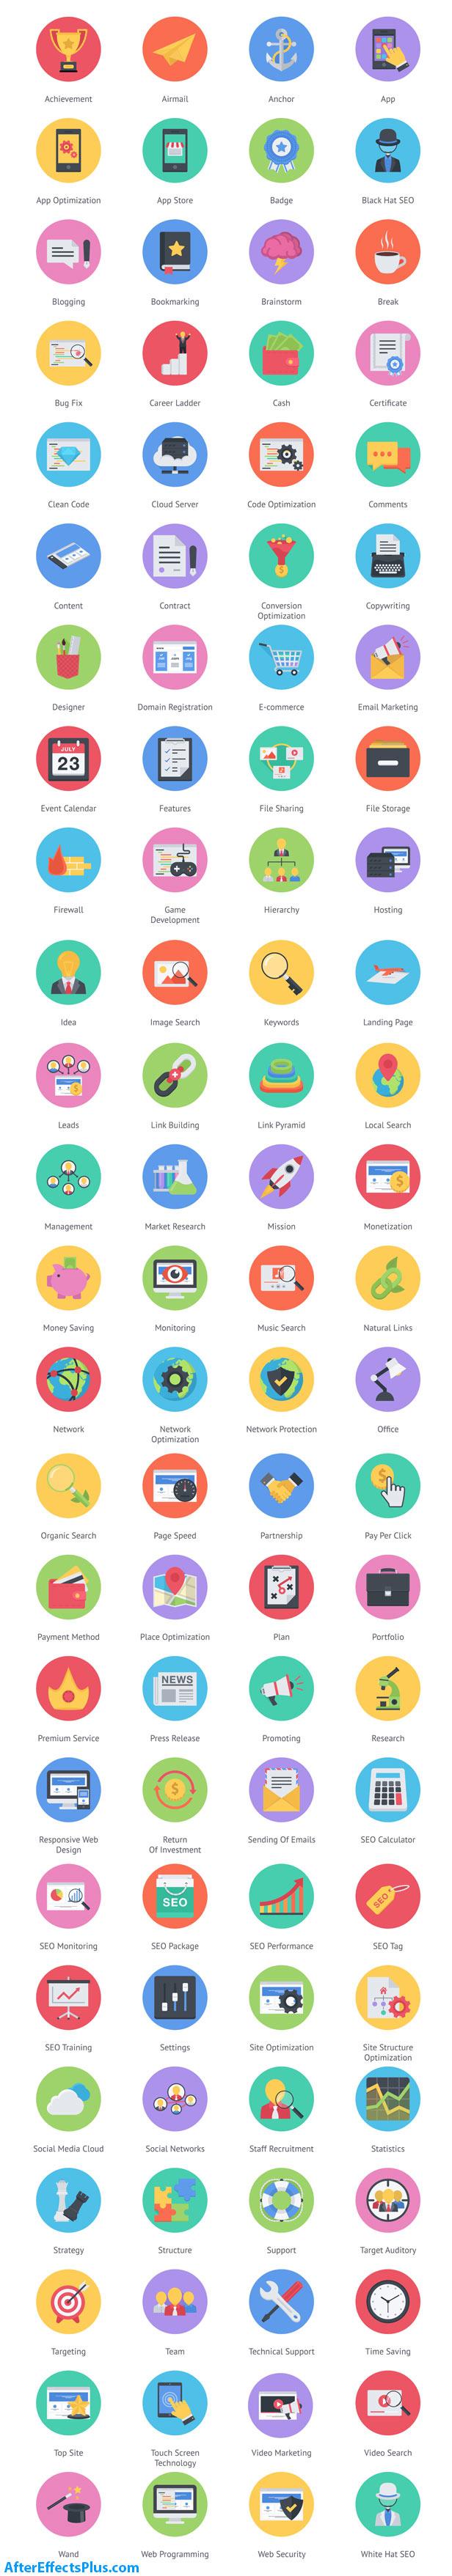 پروژه افتر افکت 100 آیکون انیمیشنی فلت - Videohive 100 Seo & Business Modern Flat Animated Icons